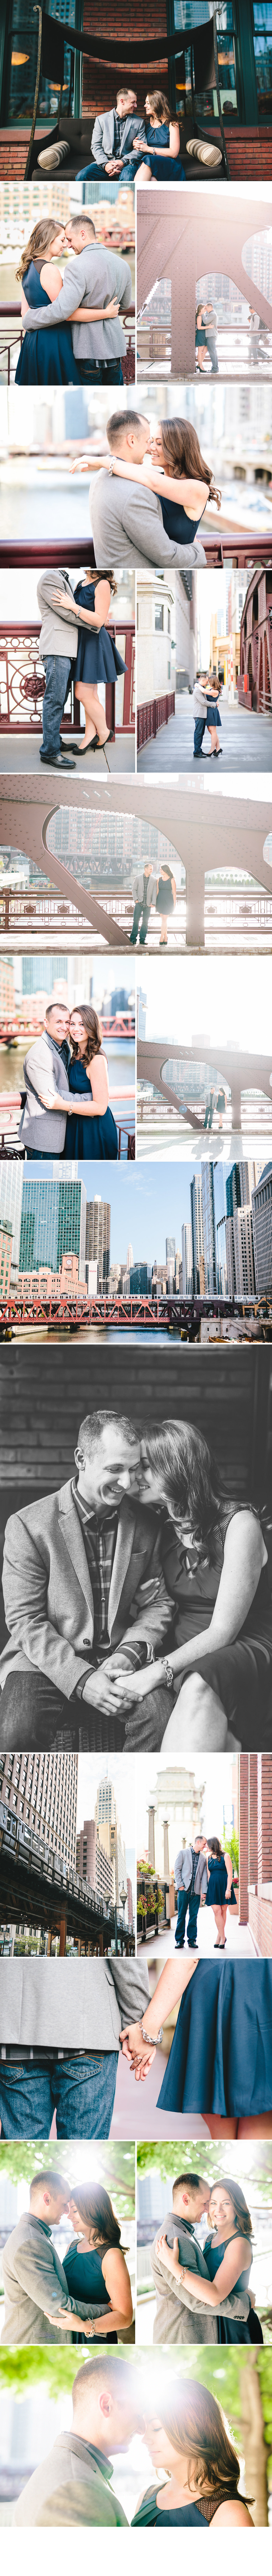 chicago-fine-art-wedding-photography-rm